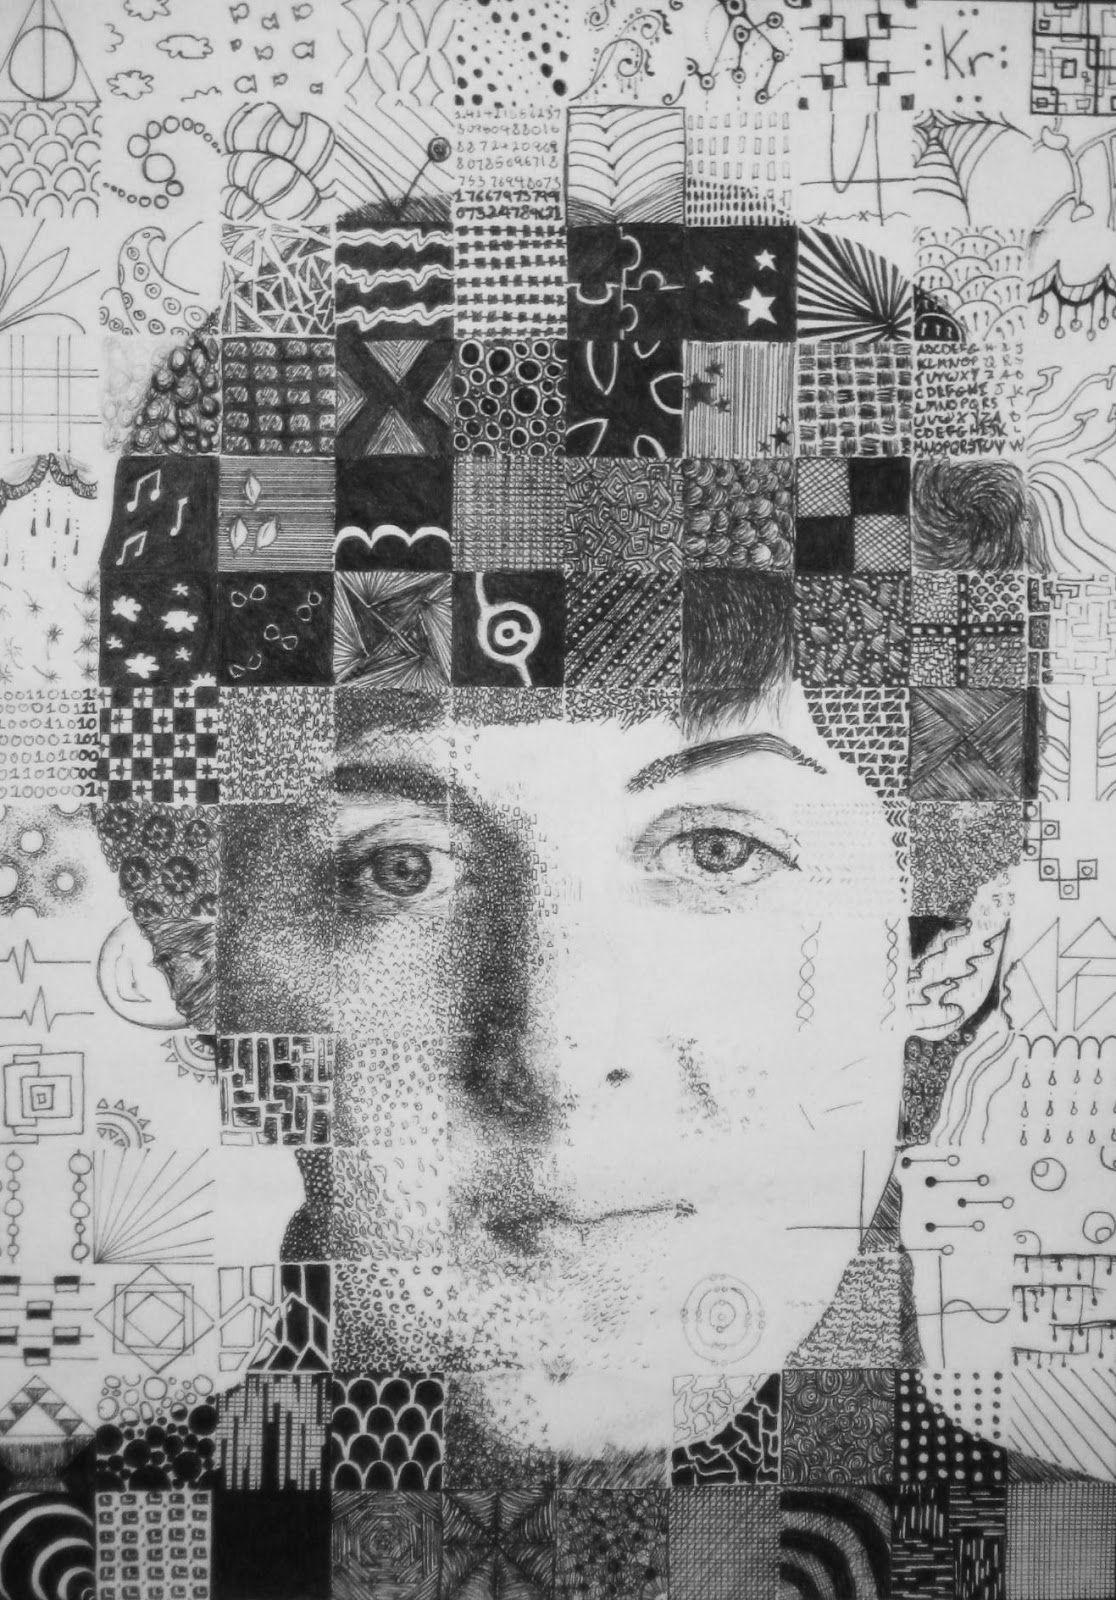 Ms Eaton S Phileonia Artonian Close To Mosaic Grid